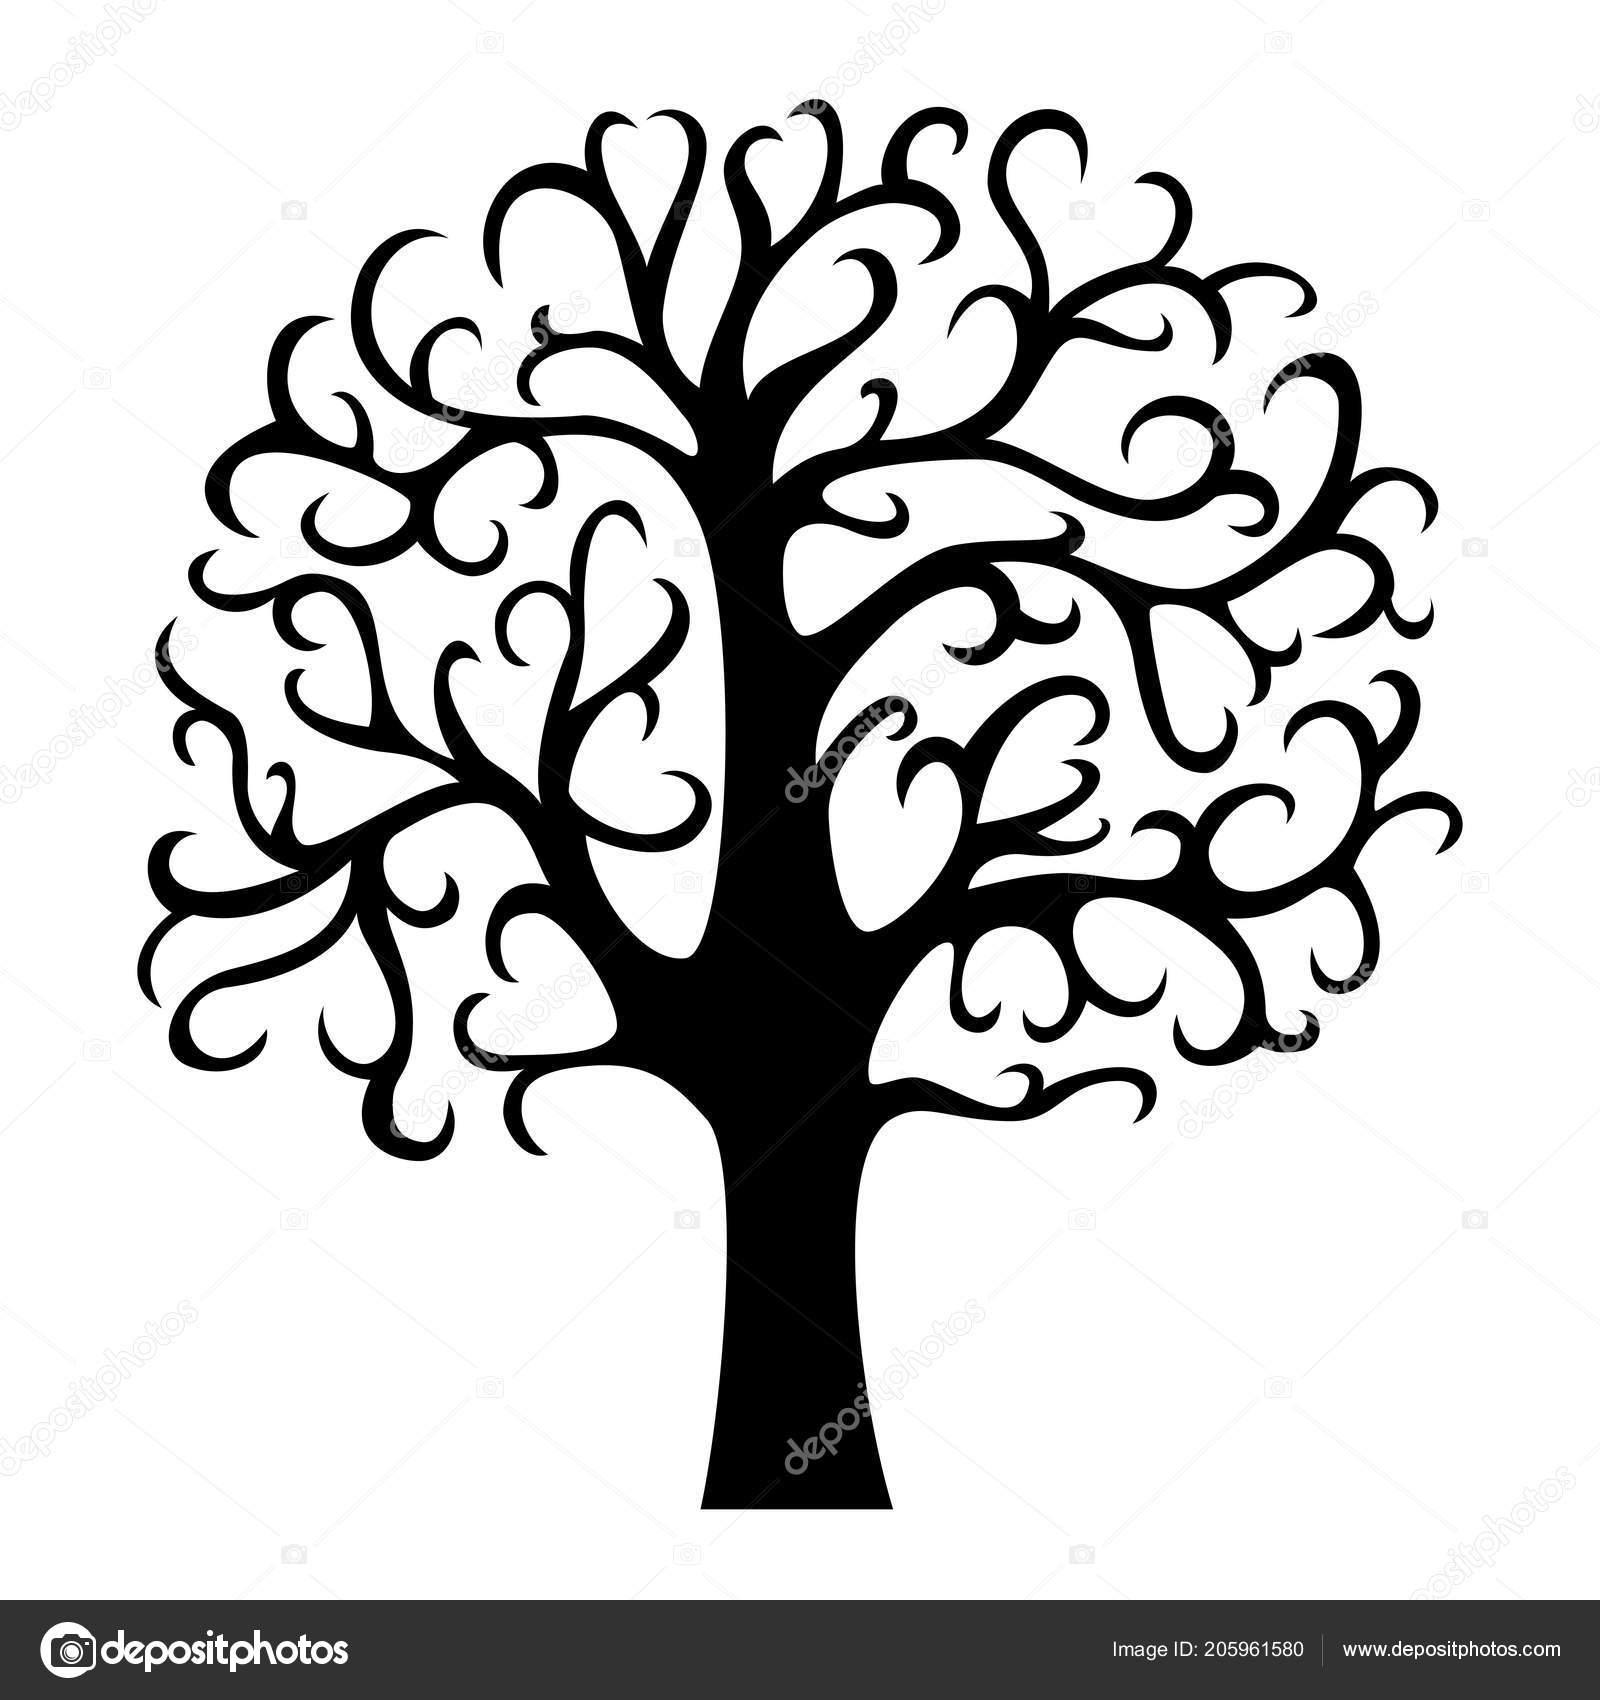 Stammbaum Silhouette Lebensbaum Vektor Illustration